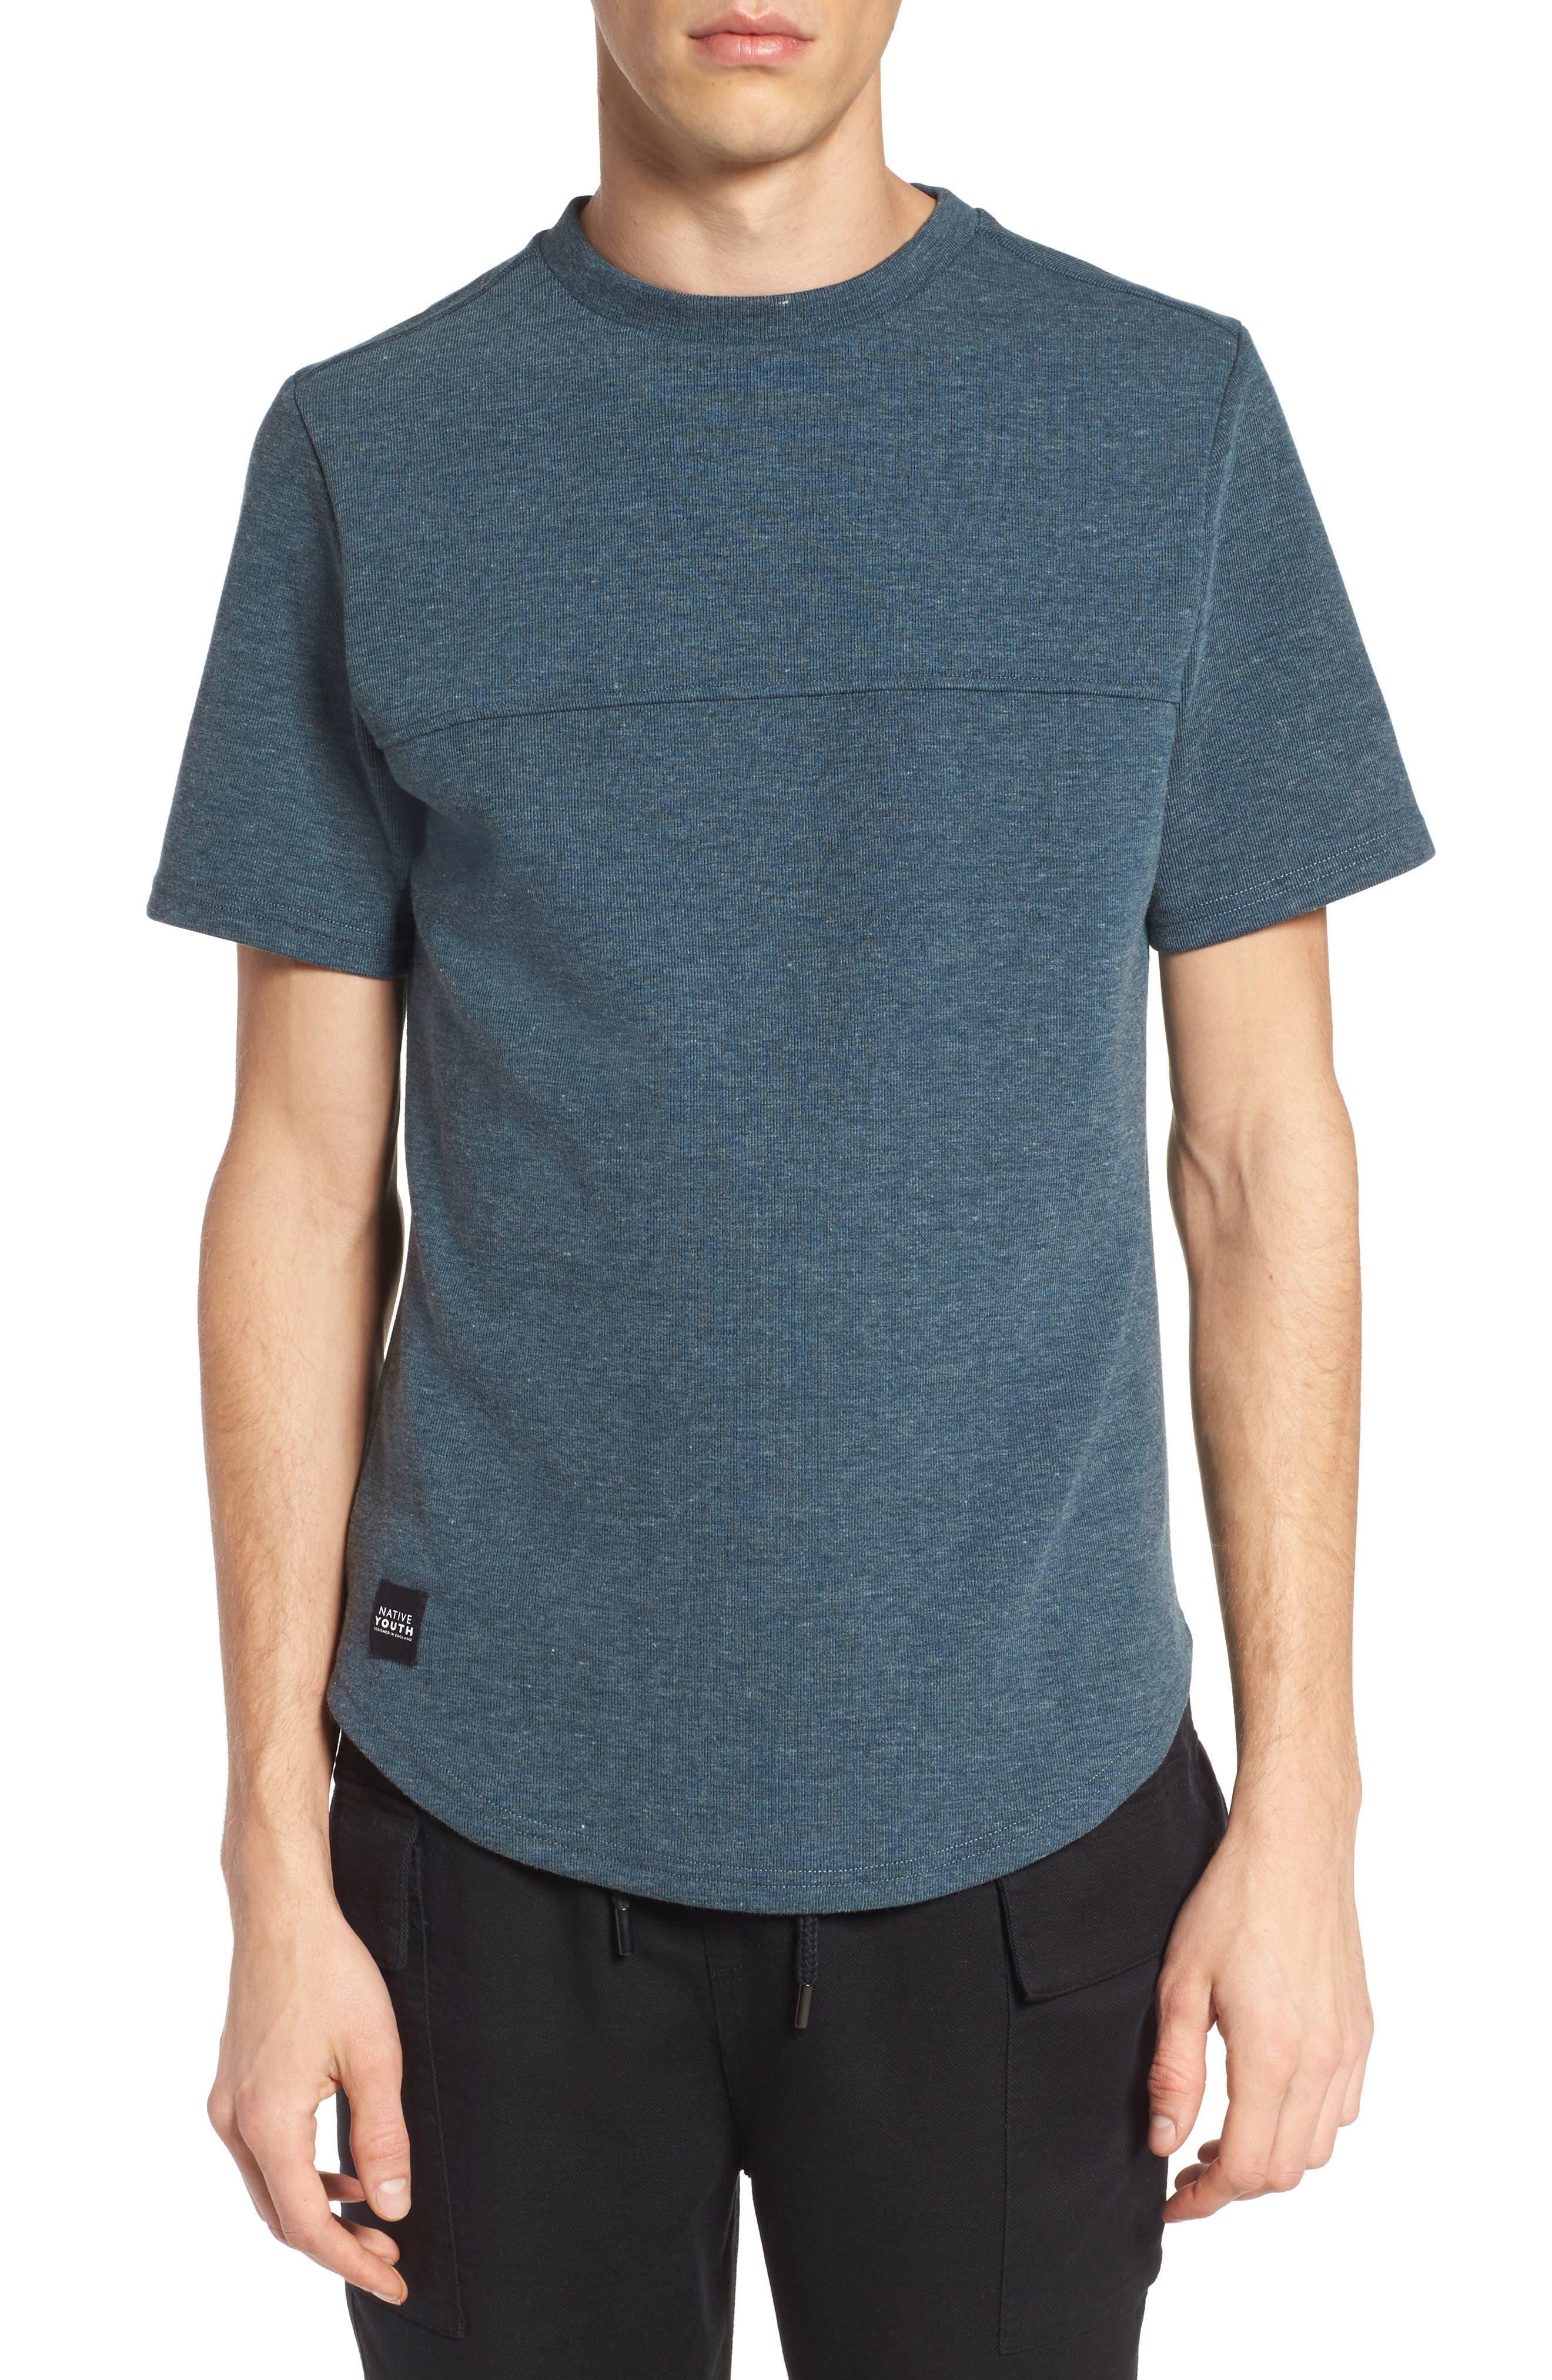 Onyx T-Shirt,                         Main,                         color, 440